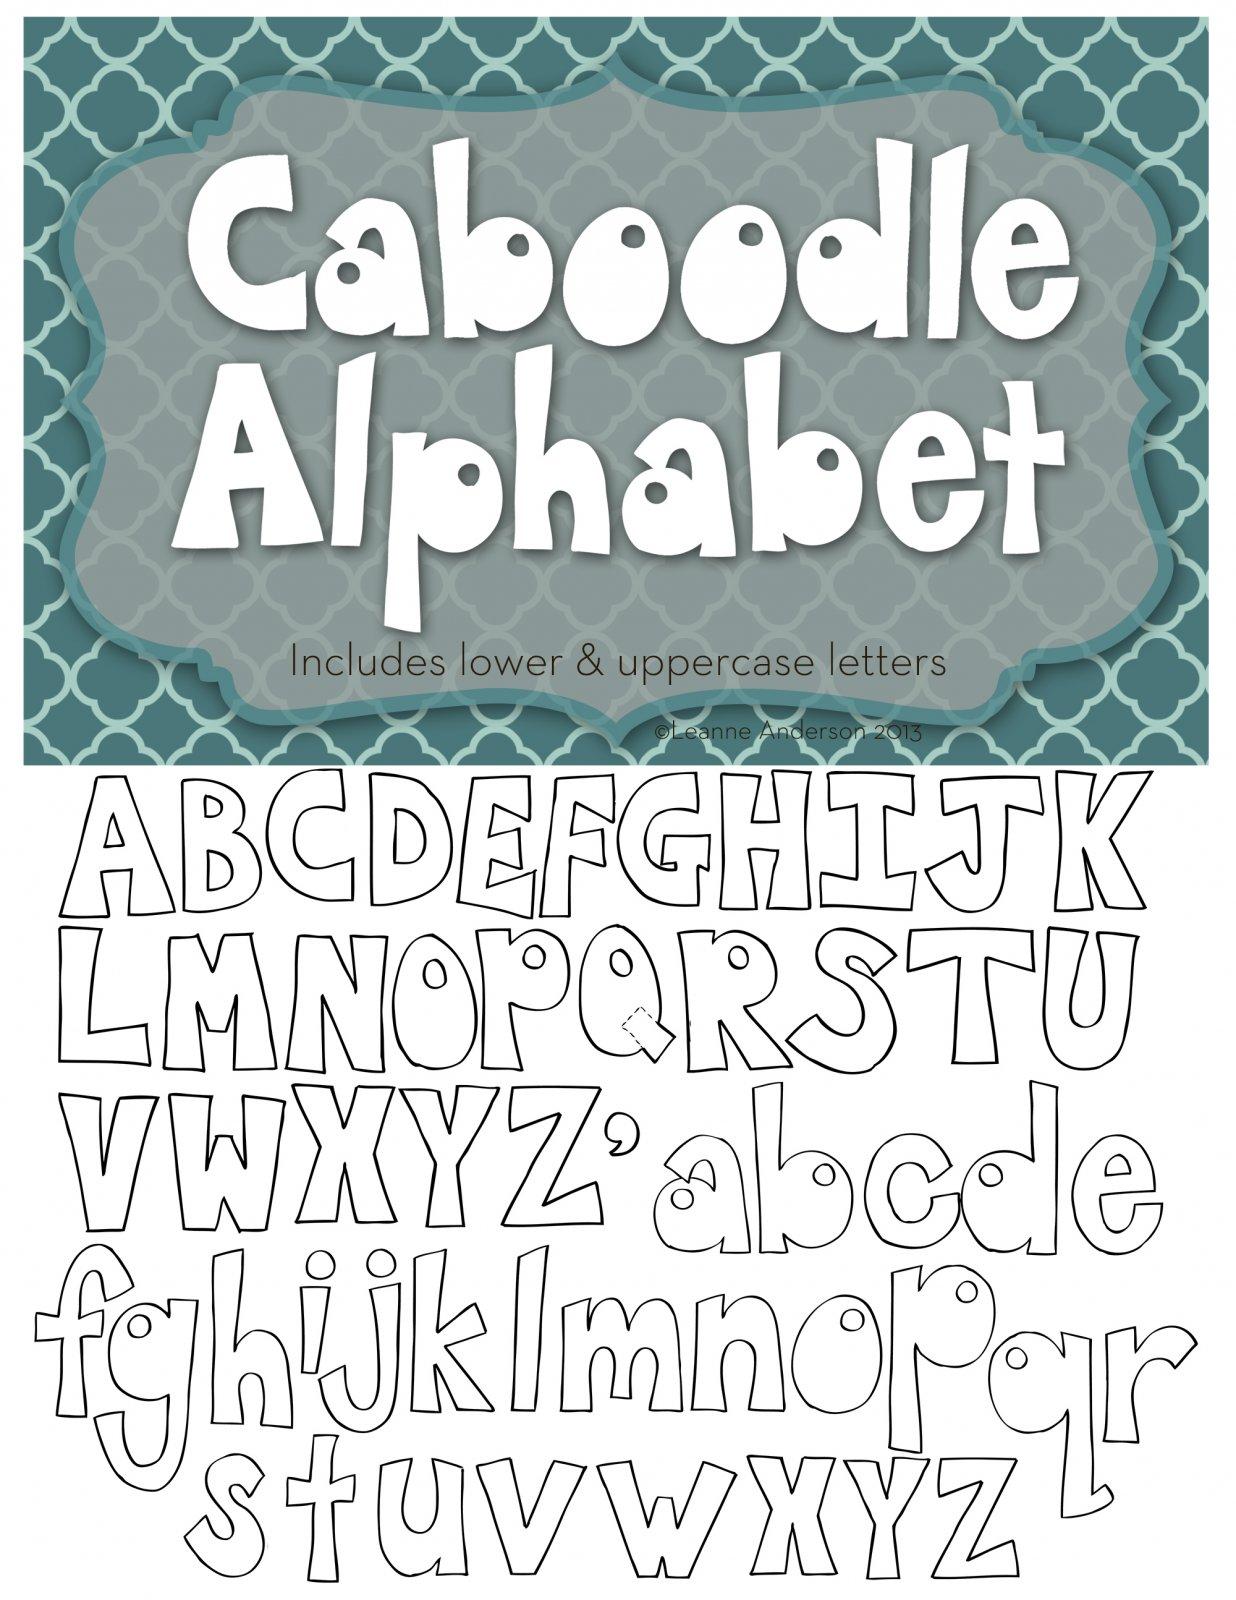 Caboodle Alphabet